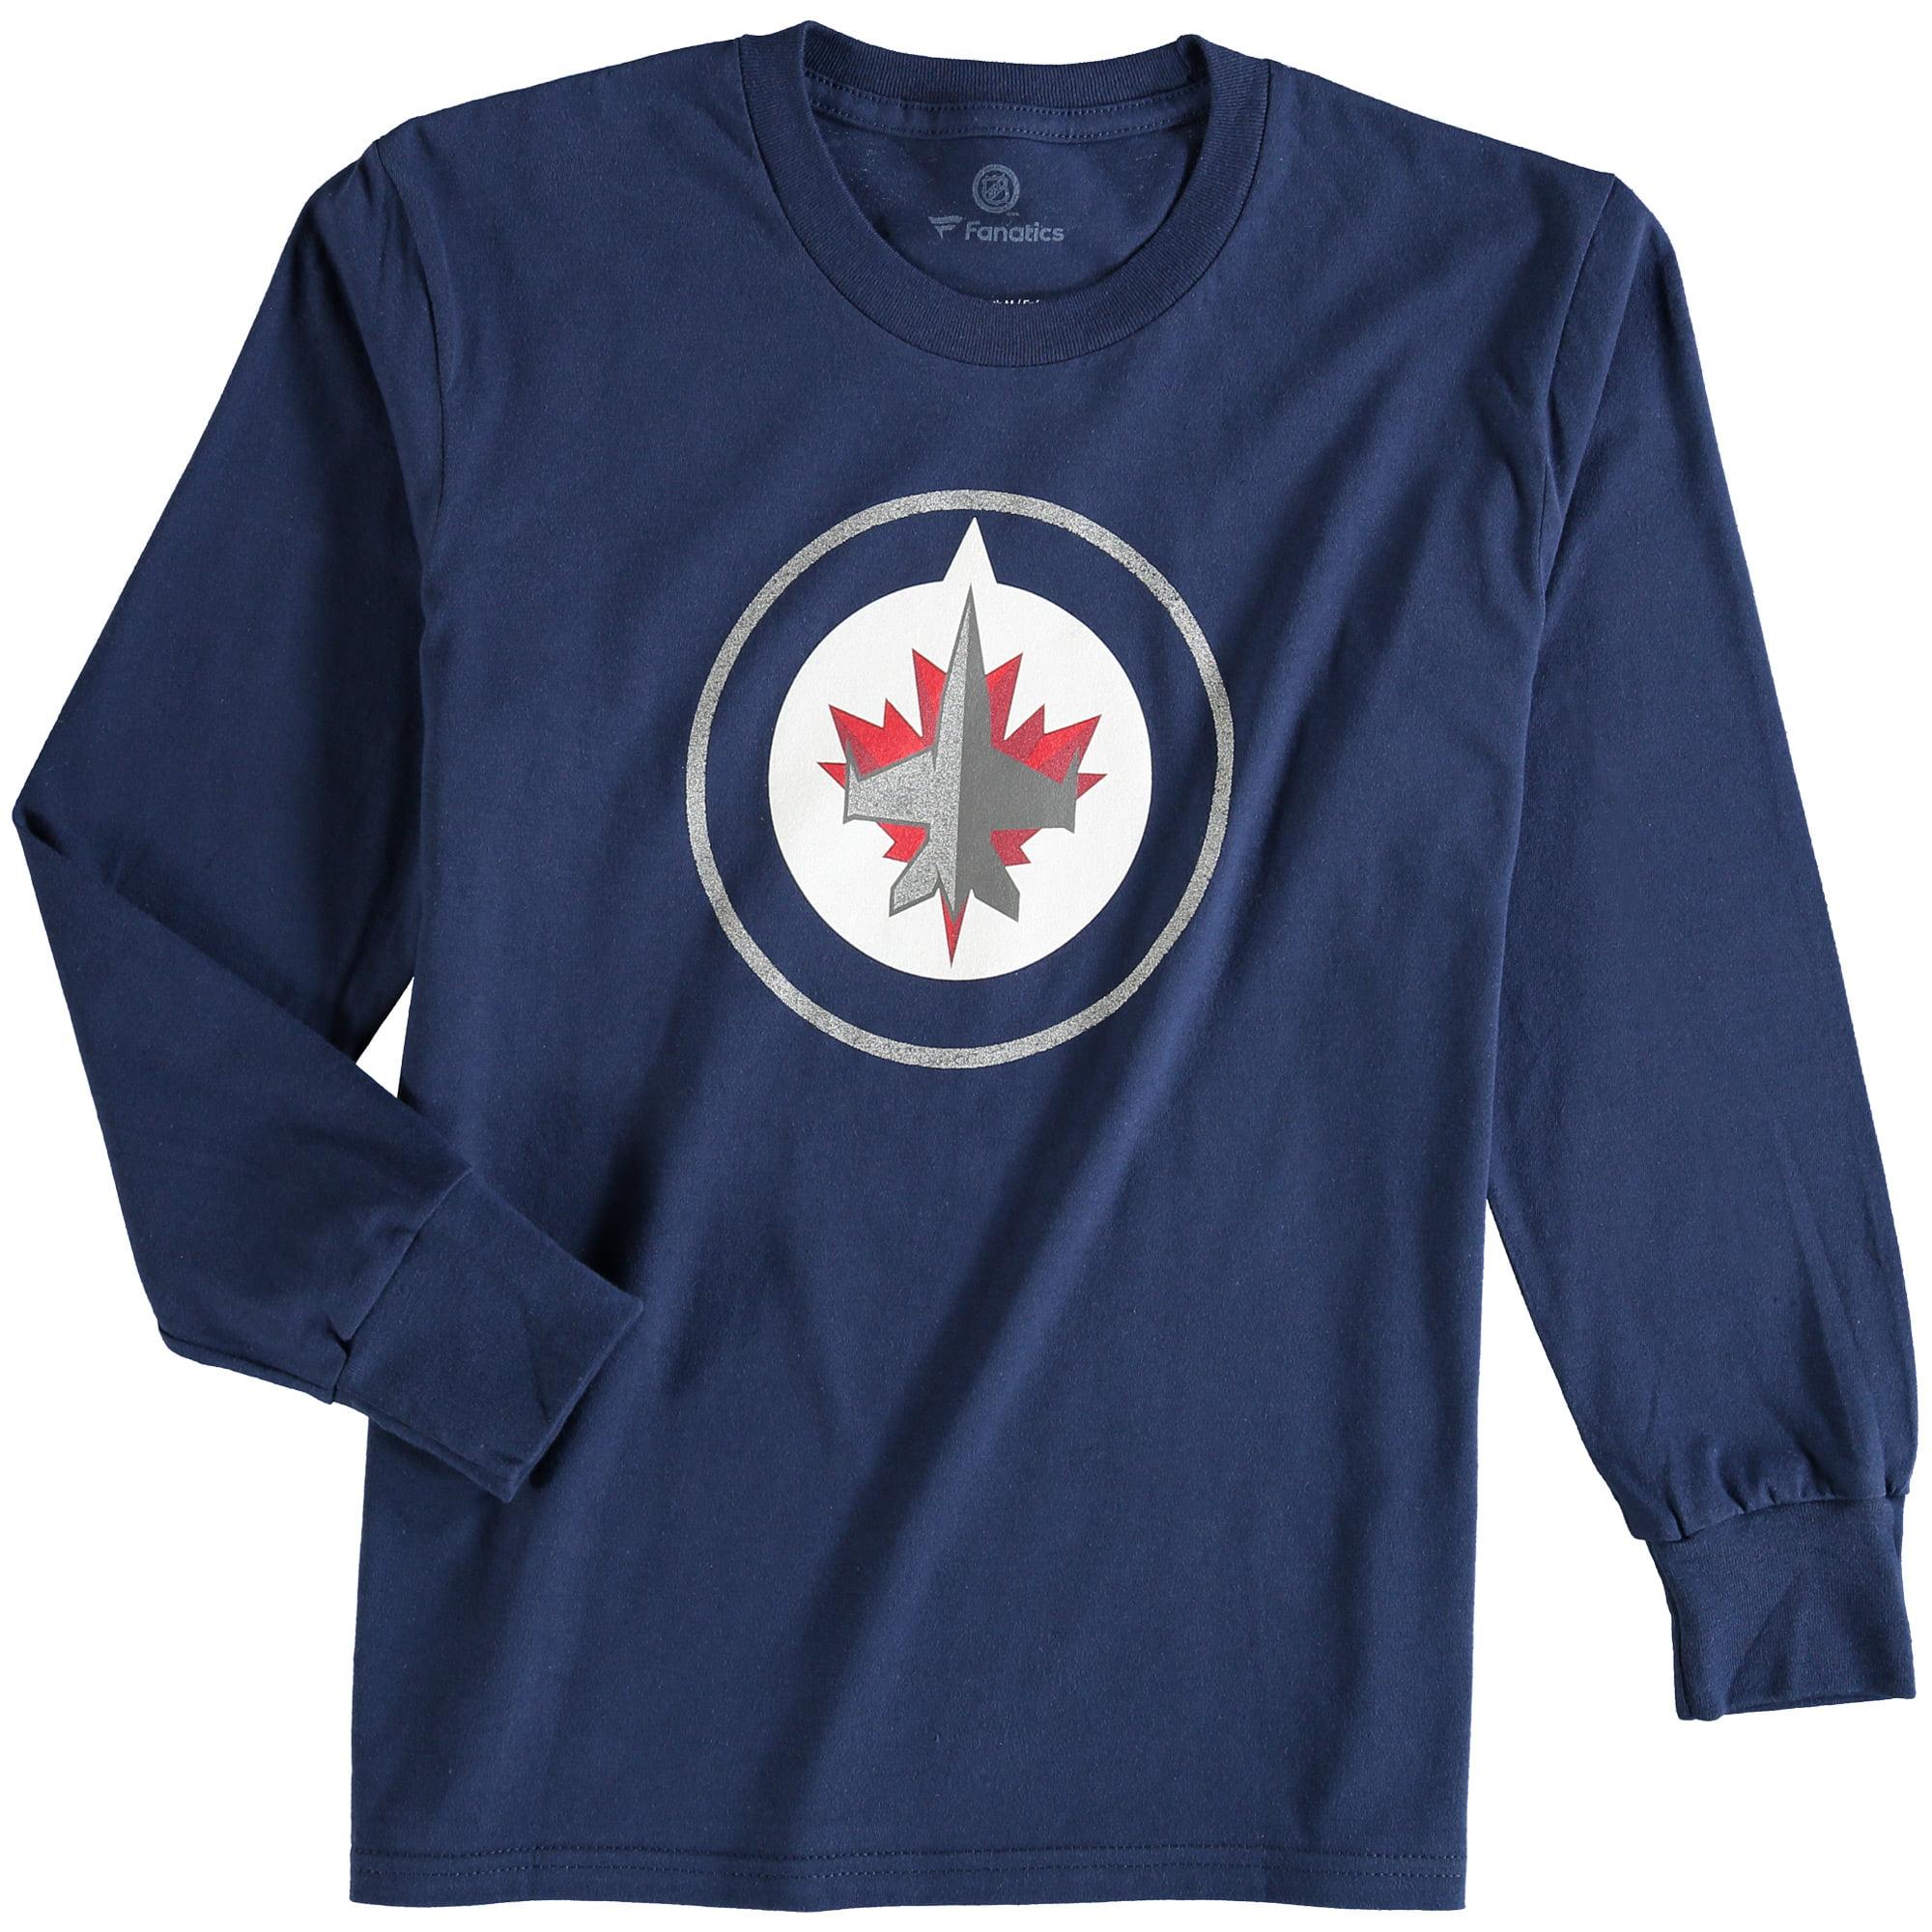 Winnipeg Jets Rinkside Youth Primary Logo Long Sleeve T-Shirt - Navy